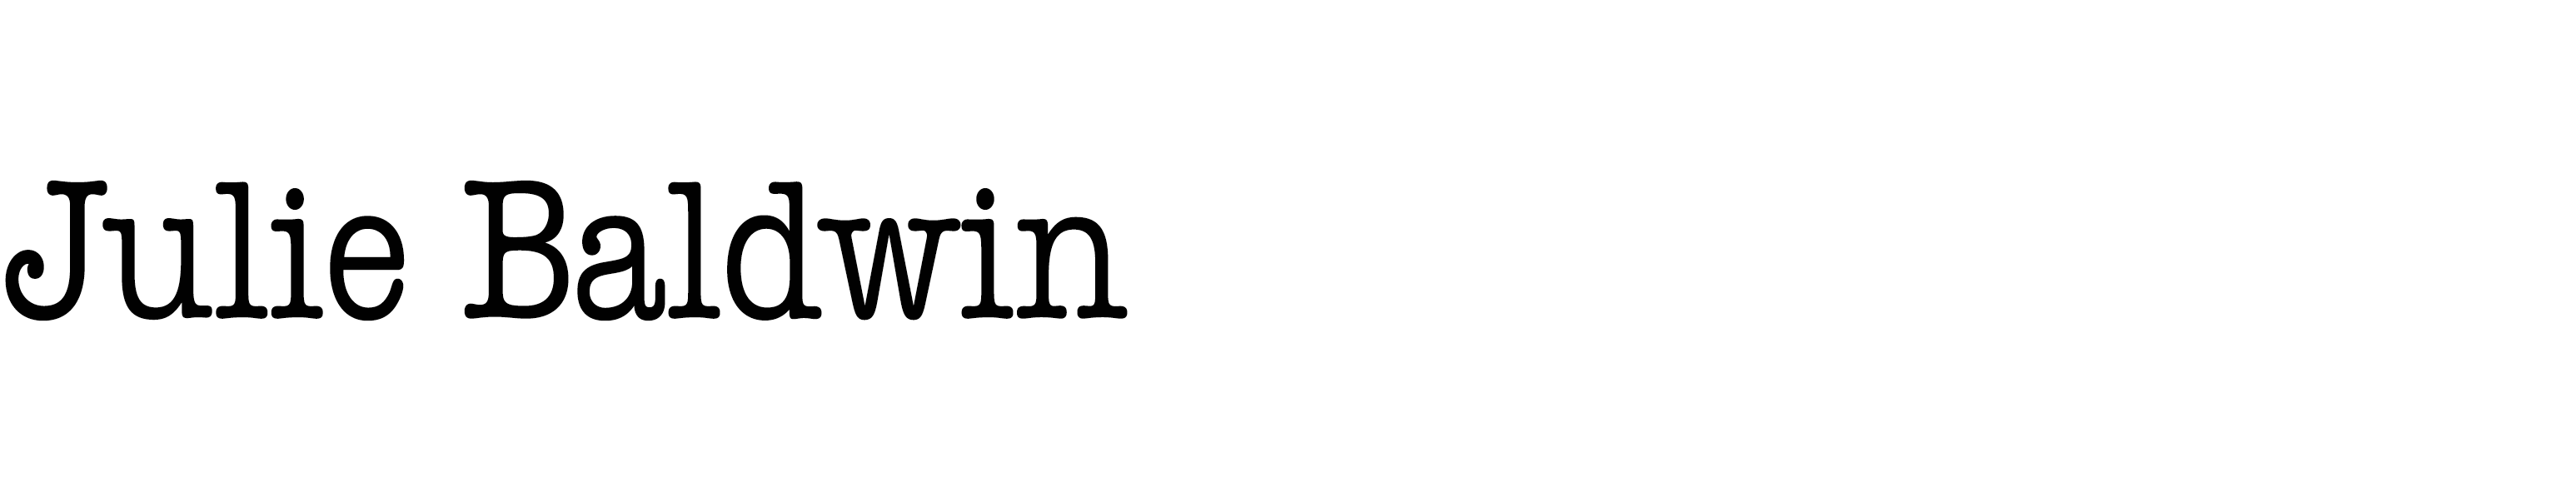 Julie Baldwin Logo